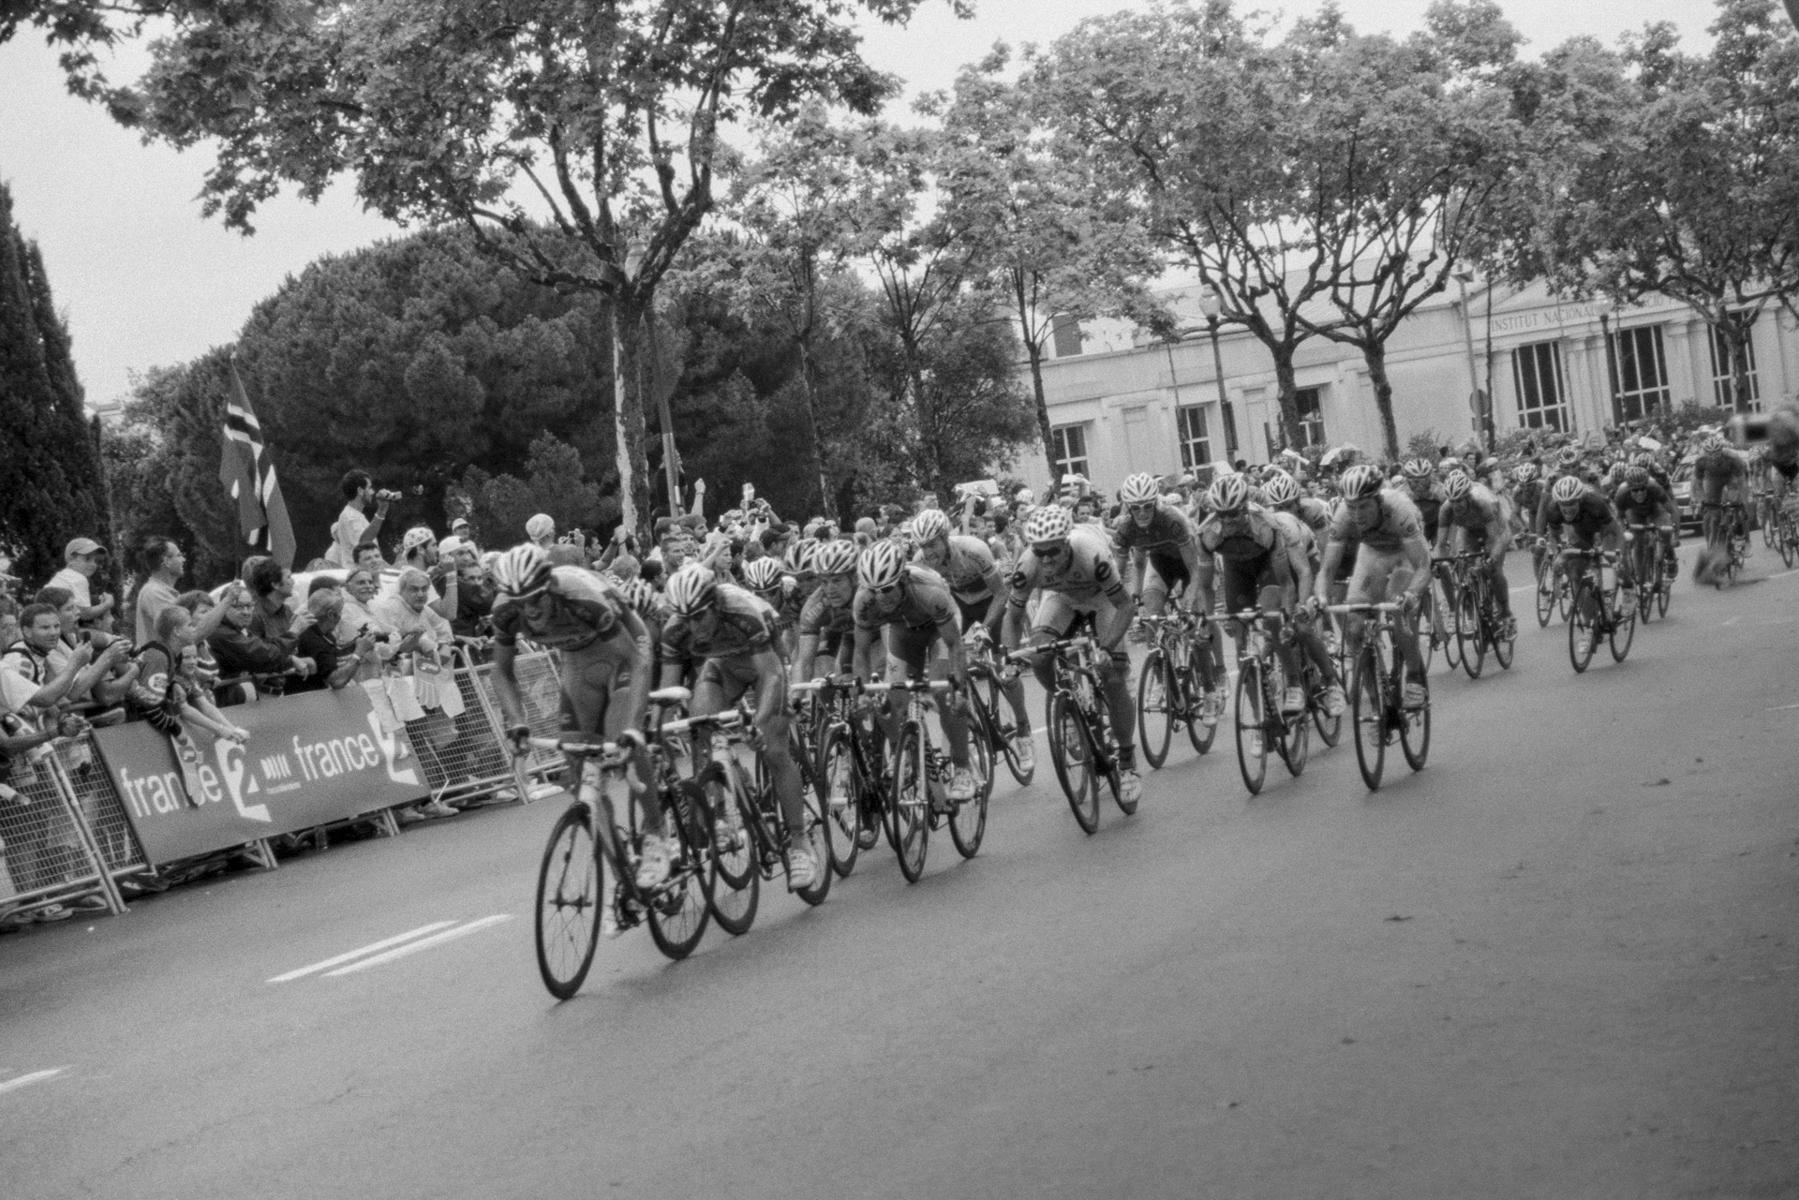 Le Tour de France 2009 Arrival after 181.5 km of cycling from Girona to Barcelona. Arrivée à Barcelone après 181,5 km de course depuis Girone. Ankunft nach 181,5 km Radrennen: von Girona nach Barcelona. Llegada después de 181,5 km: de Girona a Barcelona.